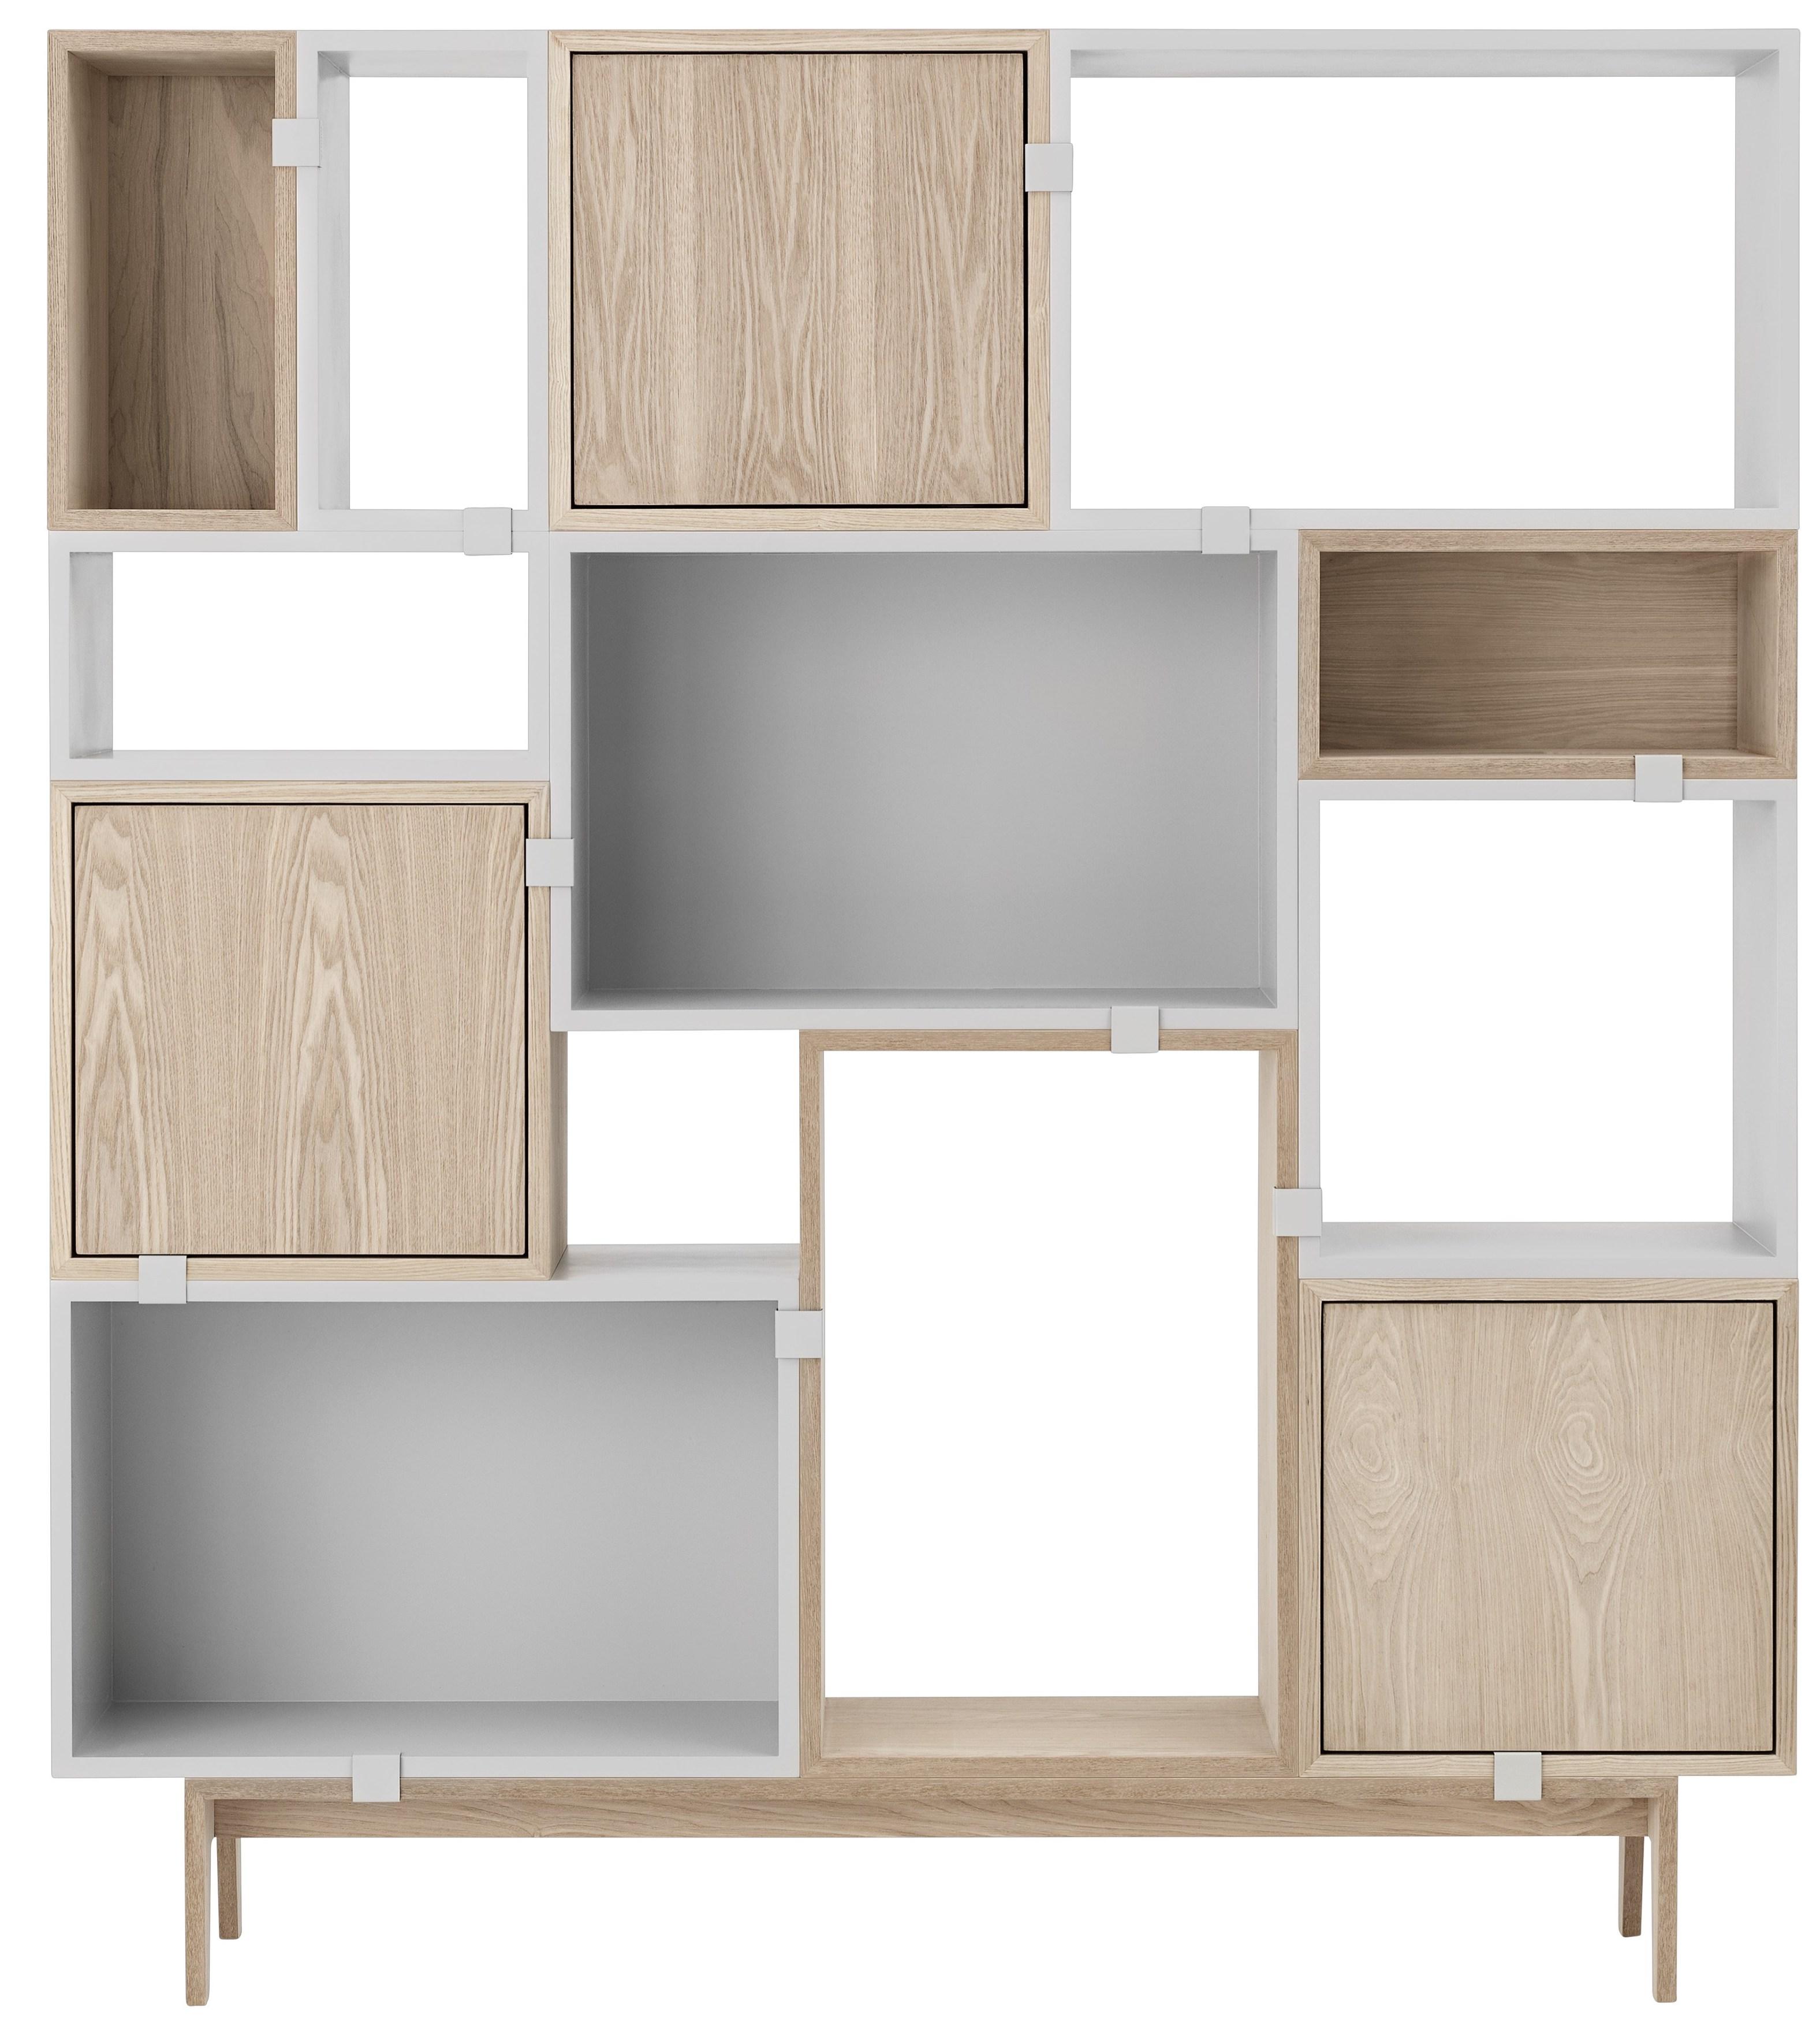 muuto stacked 2 0 syst me de rangement modulable julien de smedt. Black Bedroom Furniture Sets. Home Design Ideas